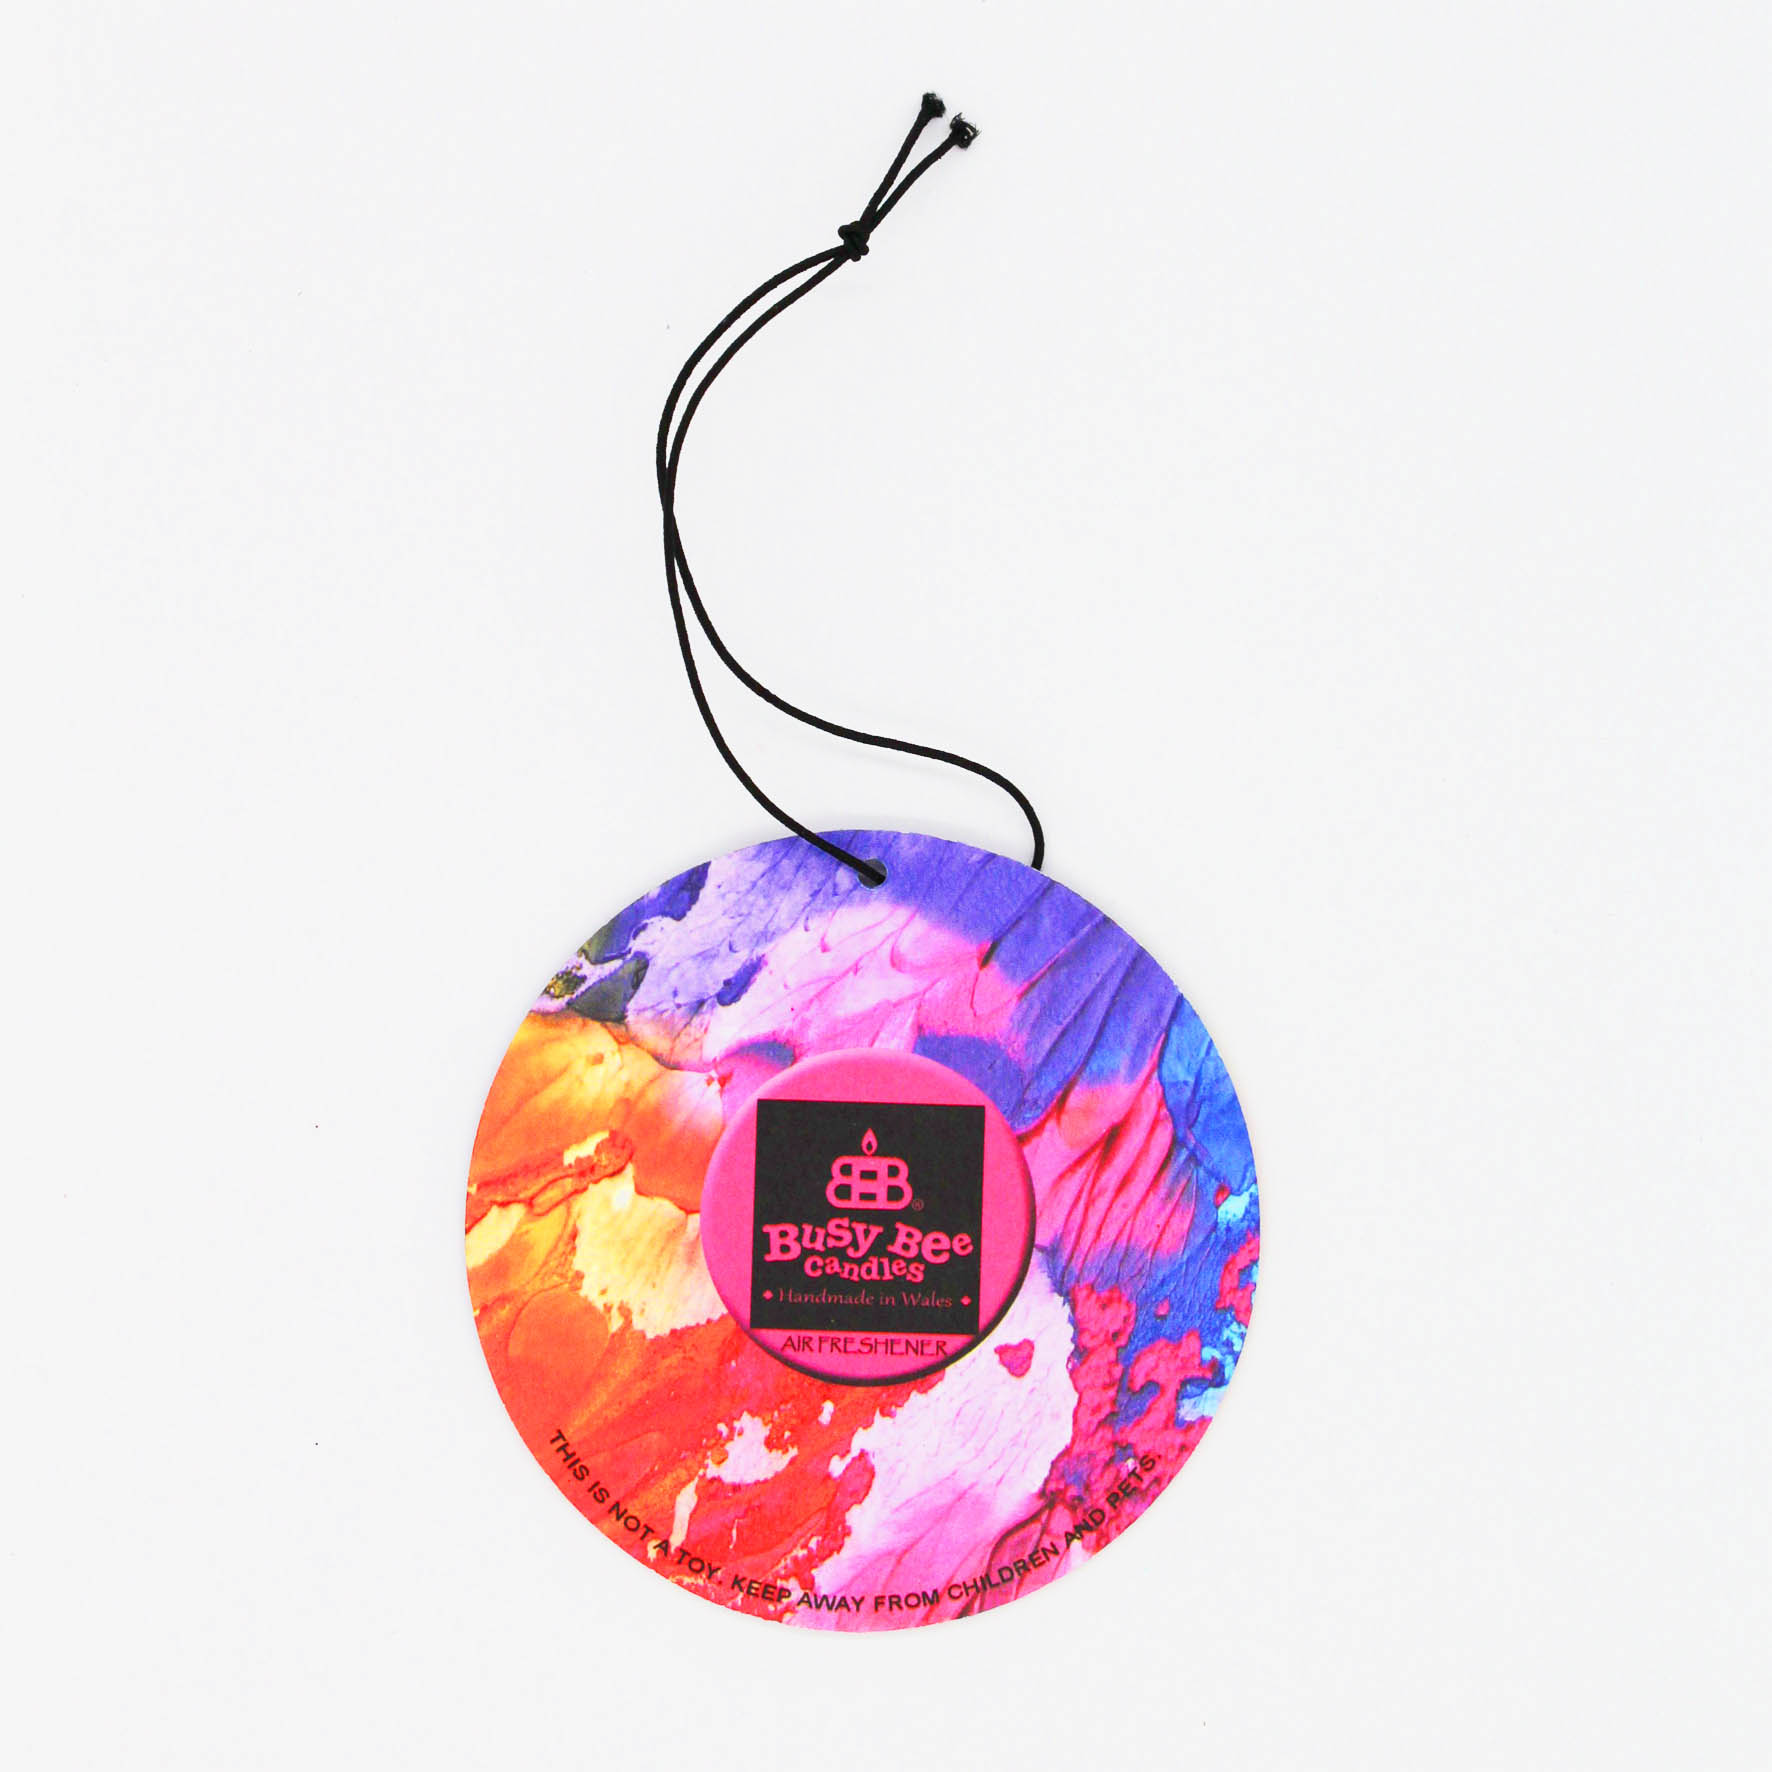 Melonade Hanging Air Freshener